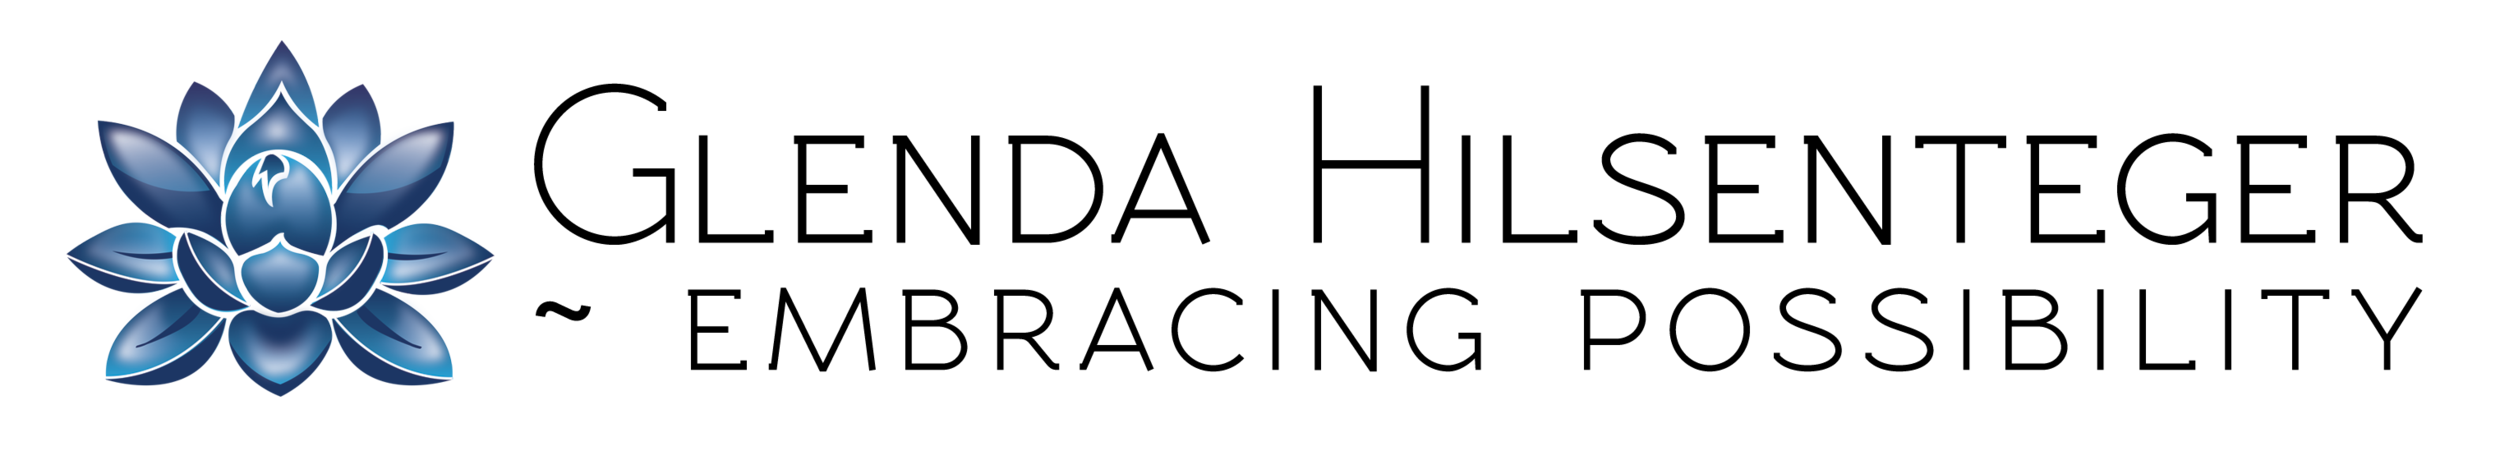 AliciaHoogveld_GlendaHilsenteger_Logo_GraphicDesign_2017_1